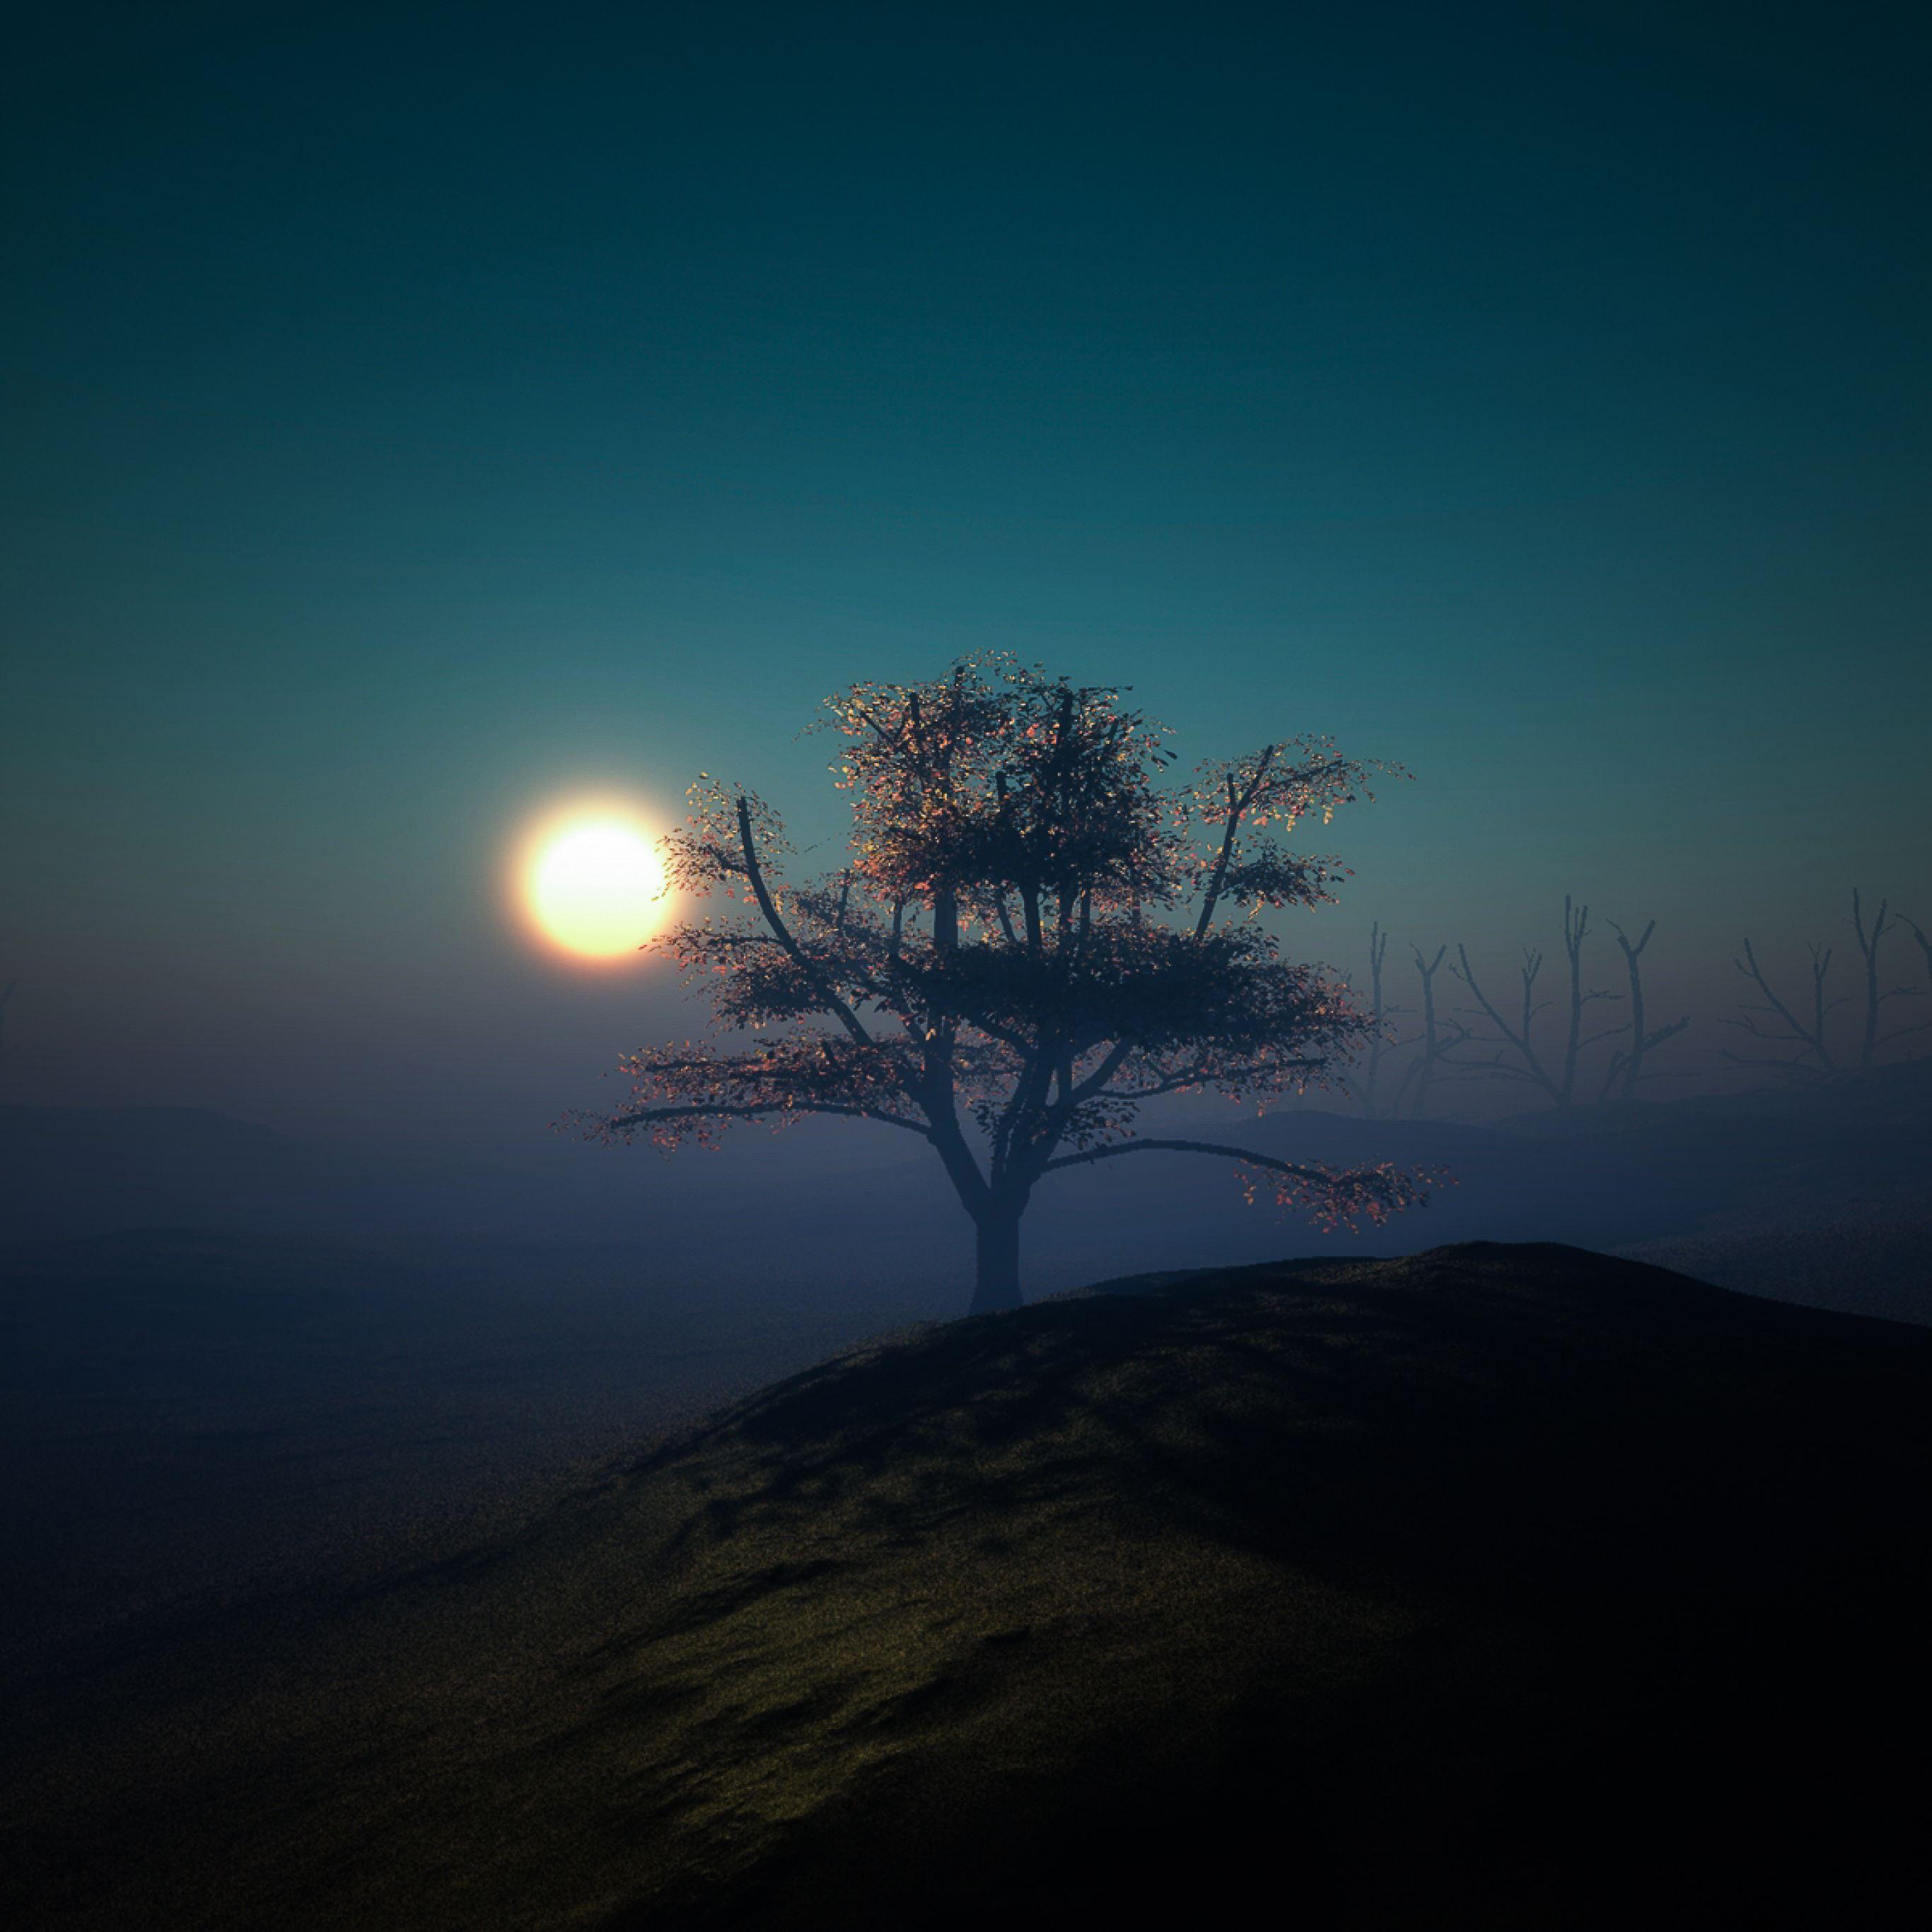 Tree sunset night lights hill iPad Pro wallpaper